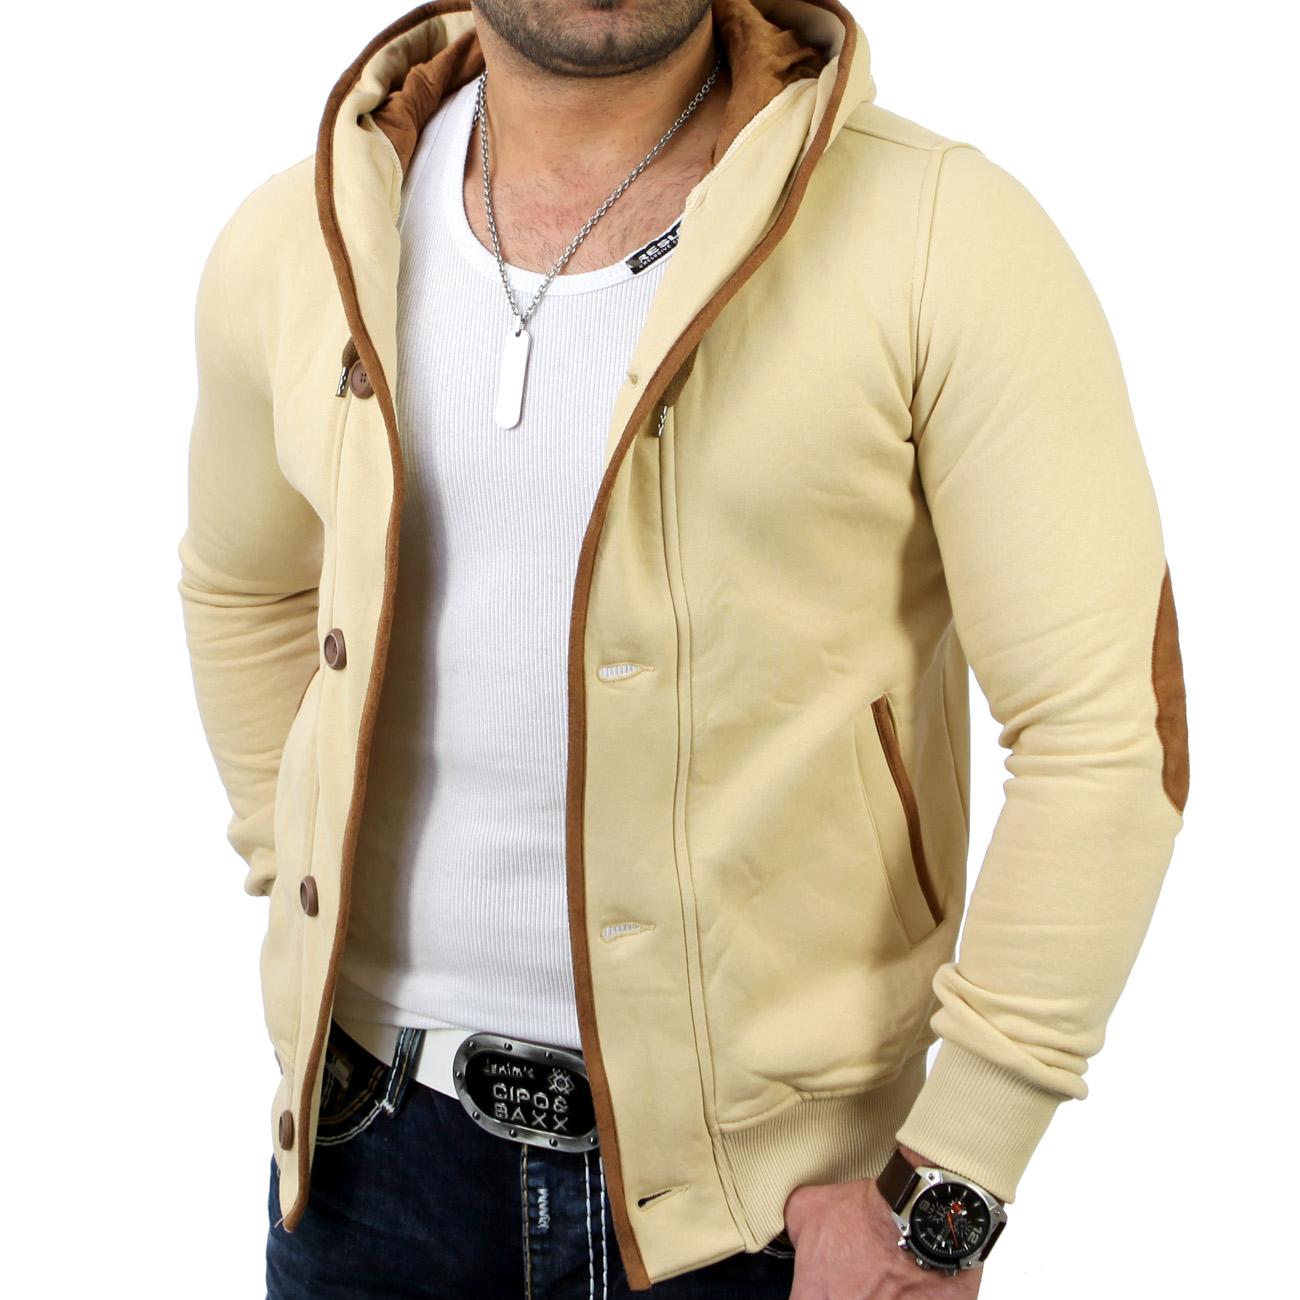 reslad rs 5066 herren kapuzen sweat jacke pullover hoody t shirt sweatshirt ebay. Black Bedroom Furniture Sets. Home Design Ideas